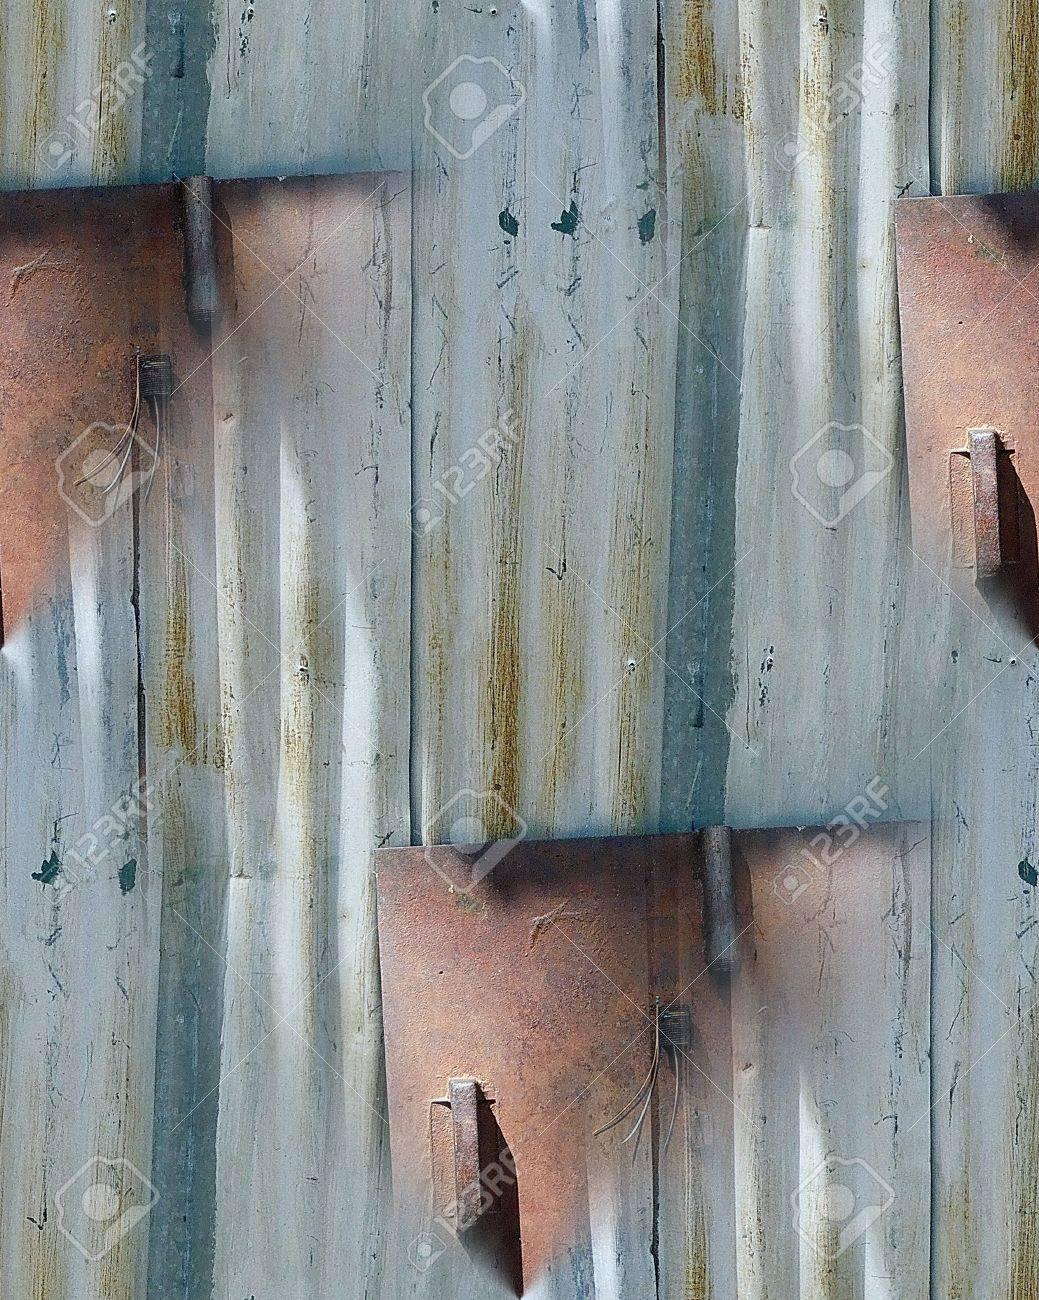 Aluminum Siding Seamless Repeating Pattern Stock Photo - 54780770